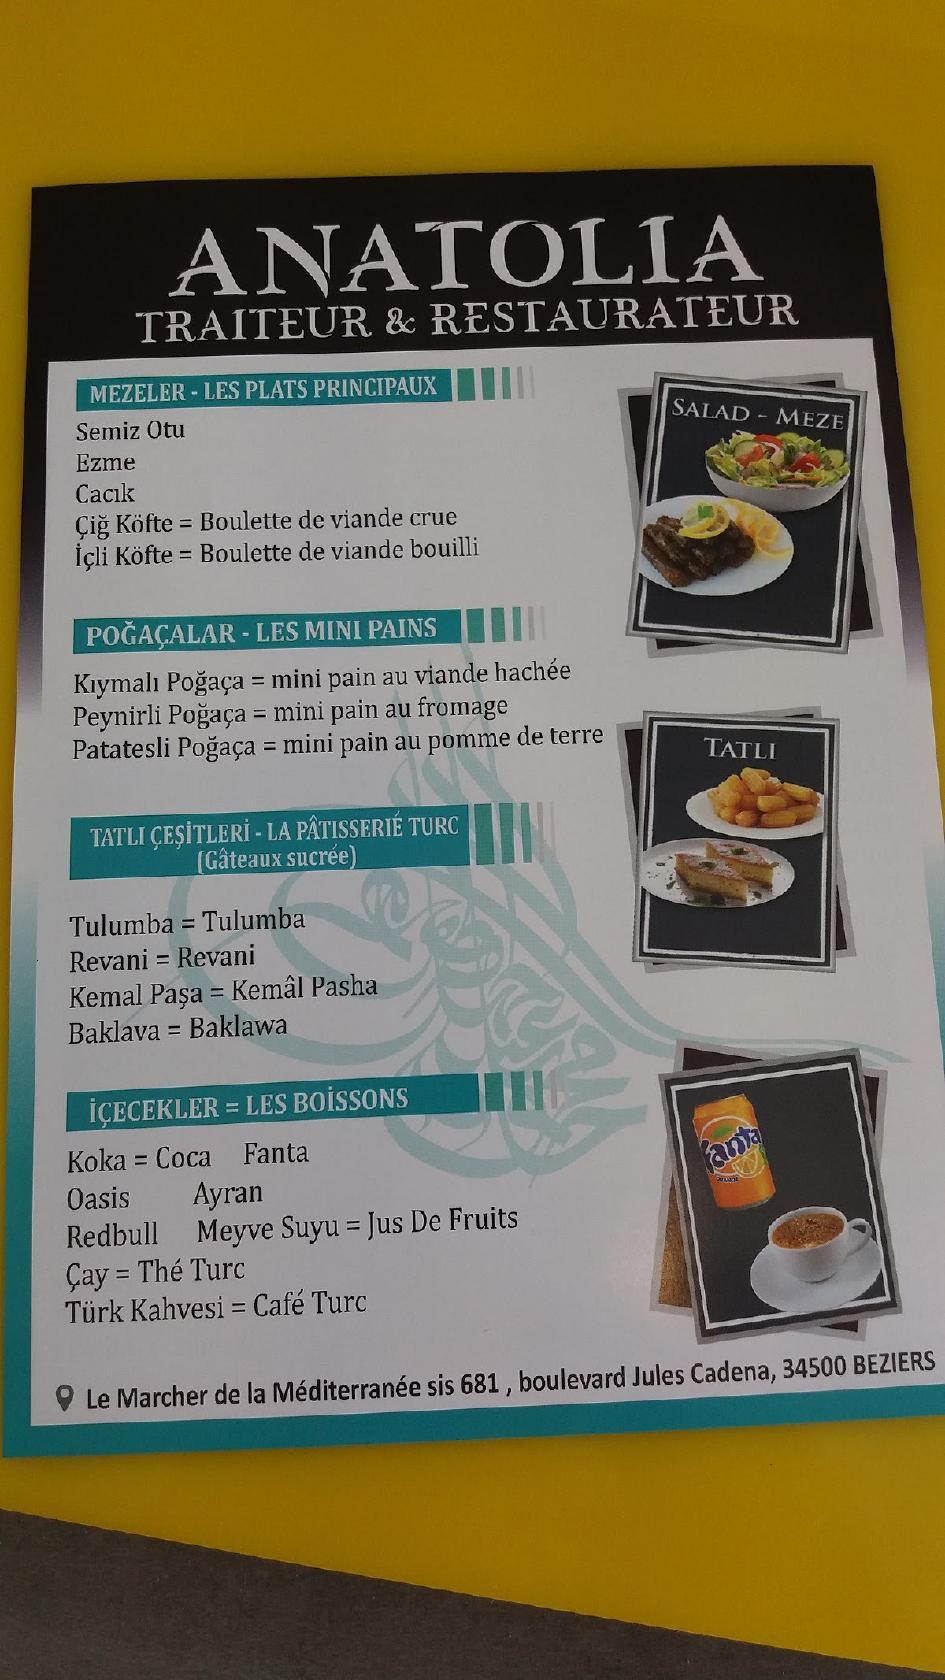 Anatolia Traiteur Restaurant Beziers Restaurant Reviews